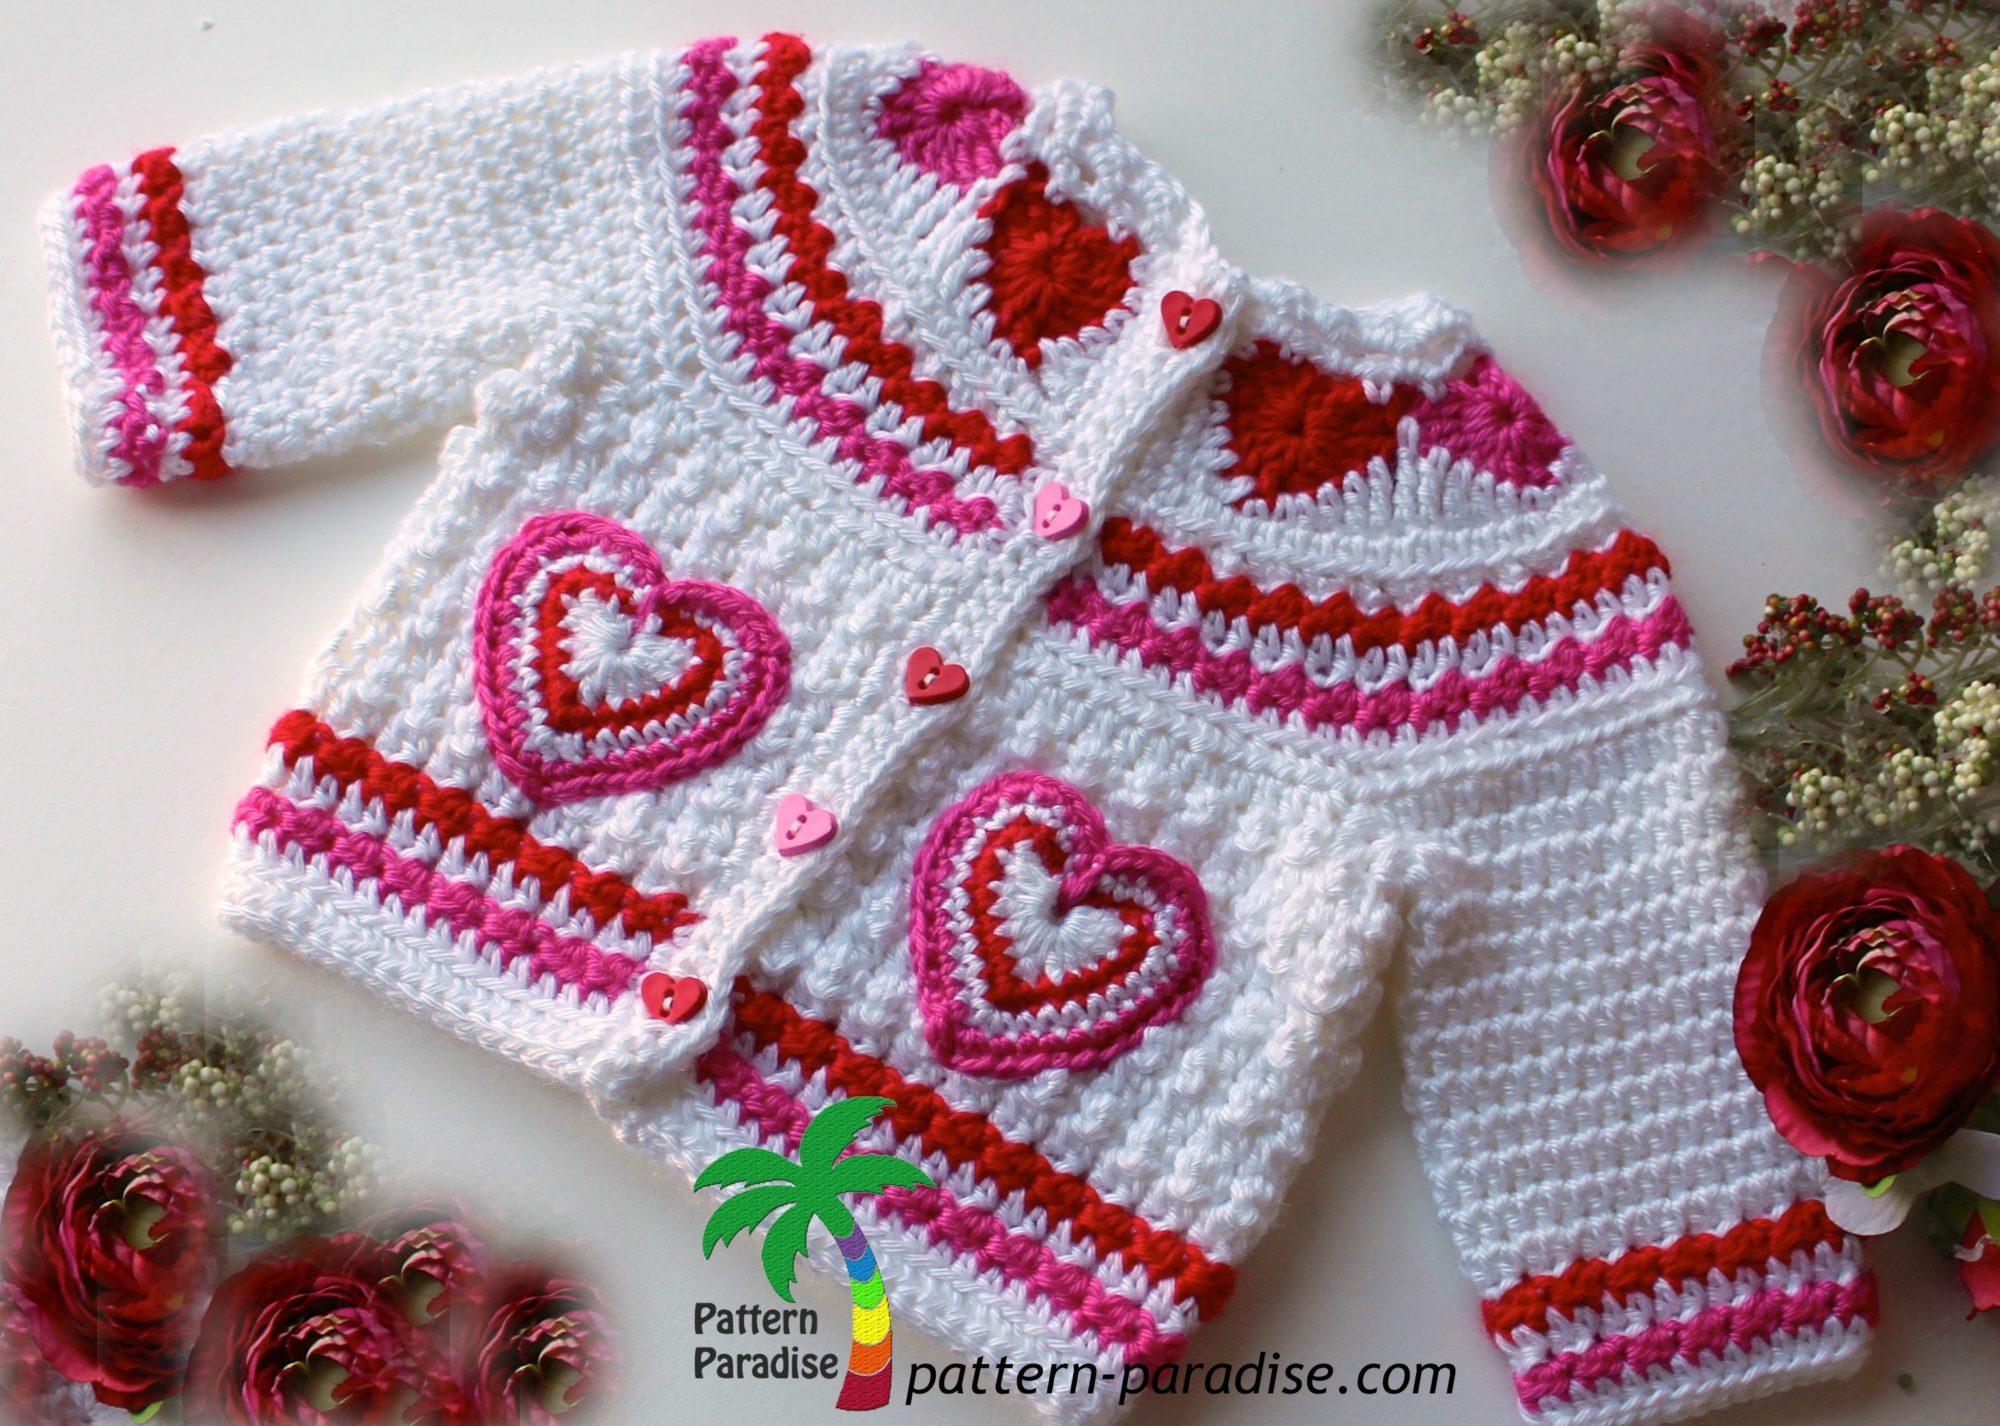 Valentine s Day Crochet Patterns : Crochet Pattern - Valentines Love Pattern Paradise